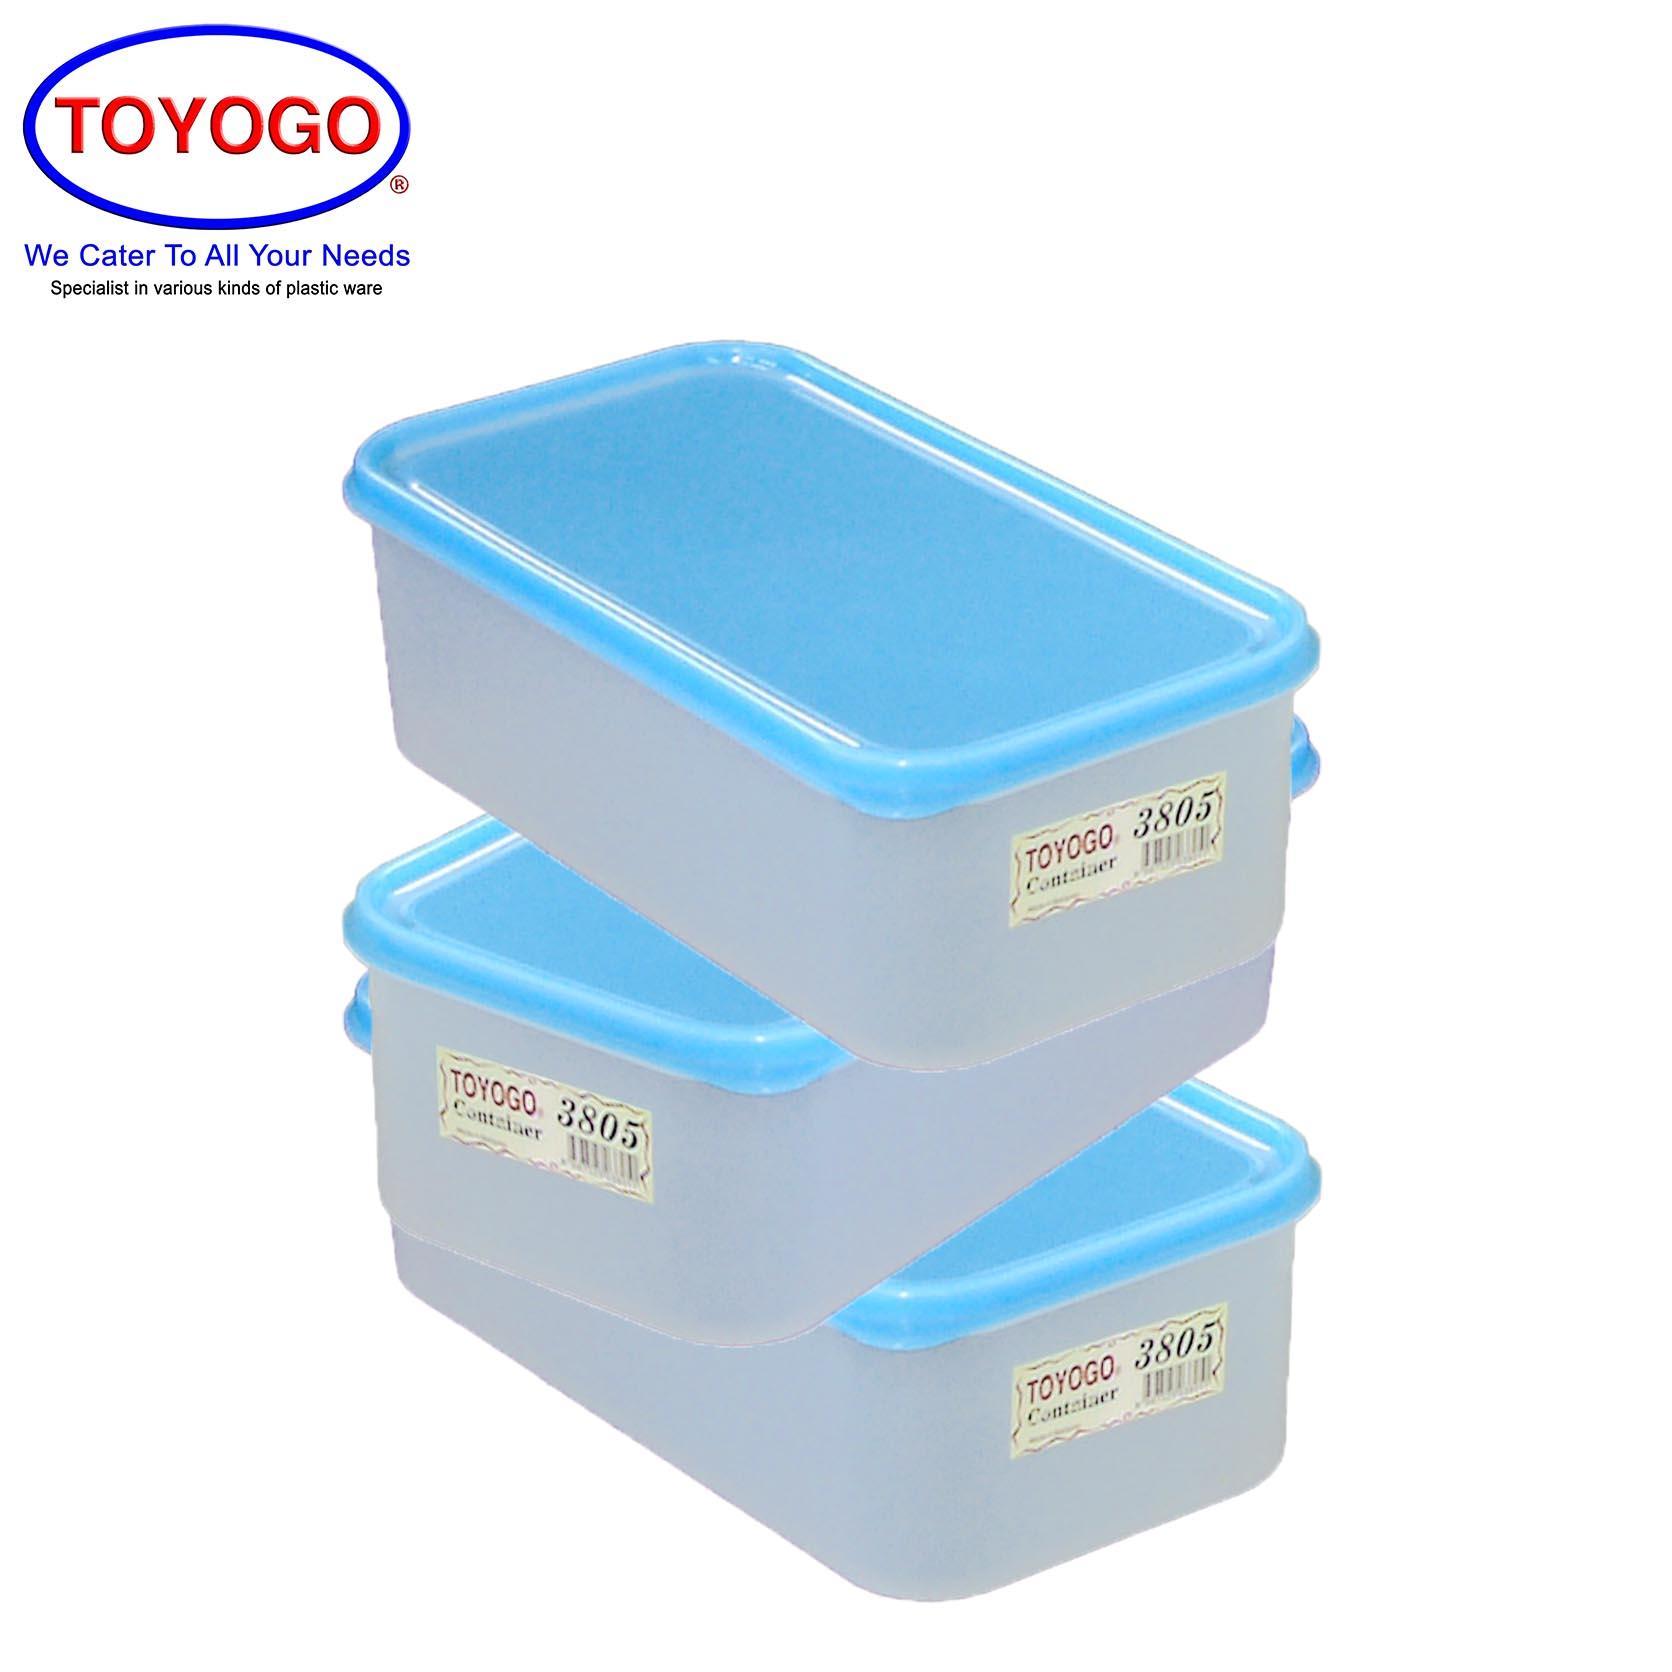 Toyogo Freezer Container (Bundle of 3) (3805)